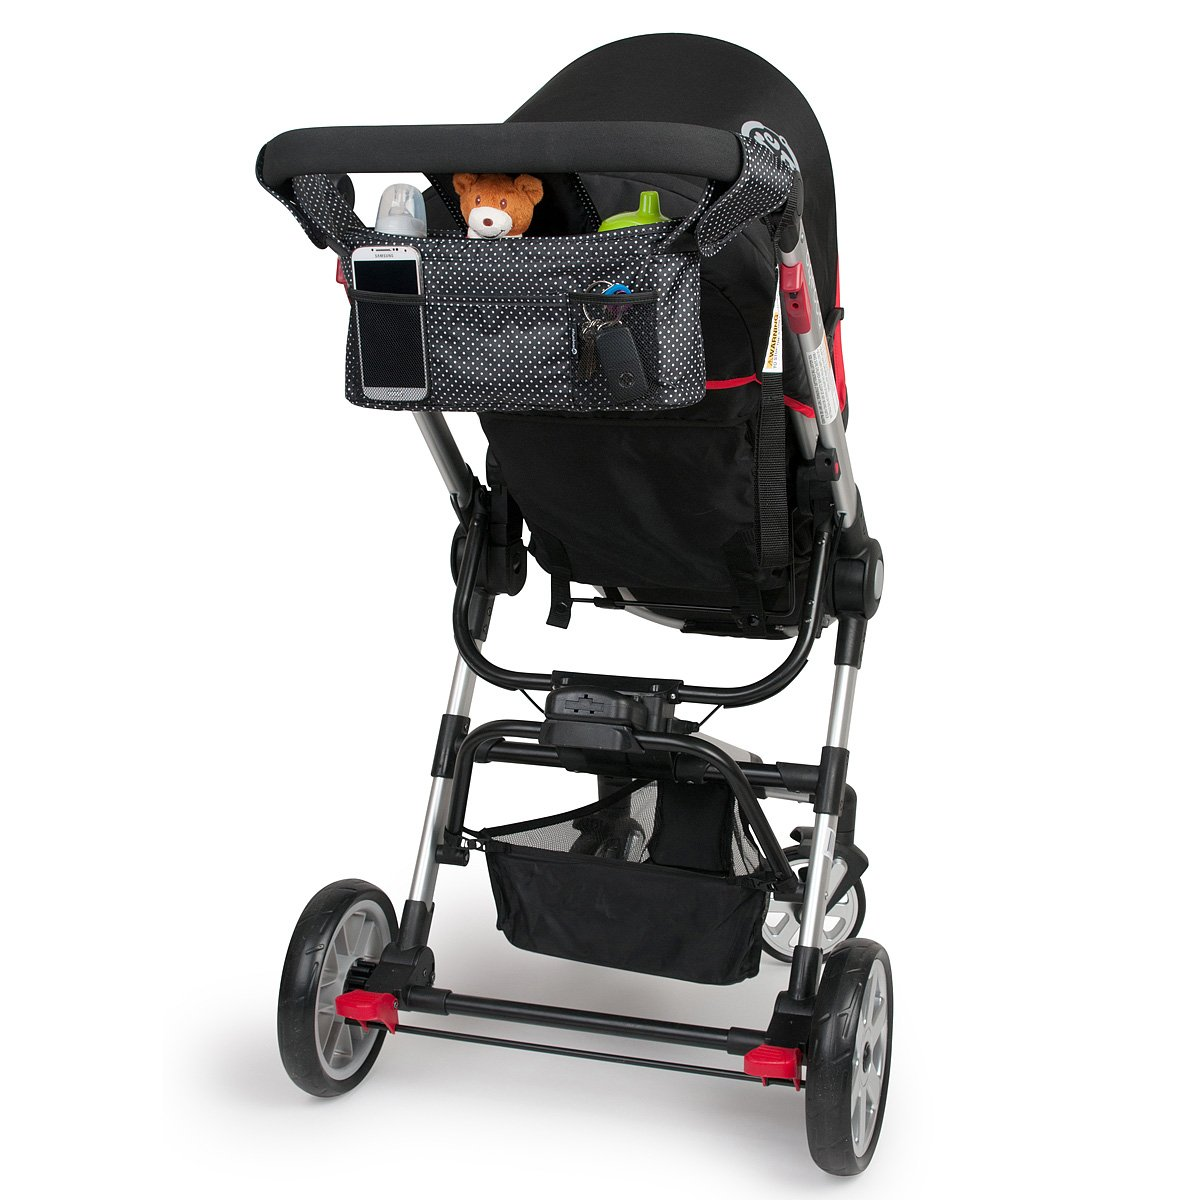 Amazon.com : Stroller Organizer for Stylish Moms - Deluxe ...